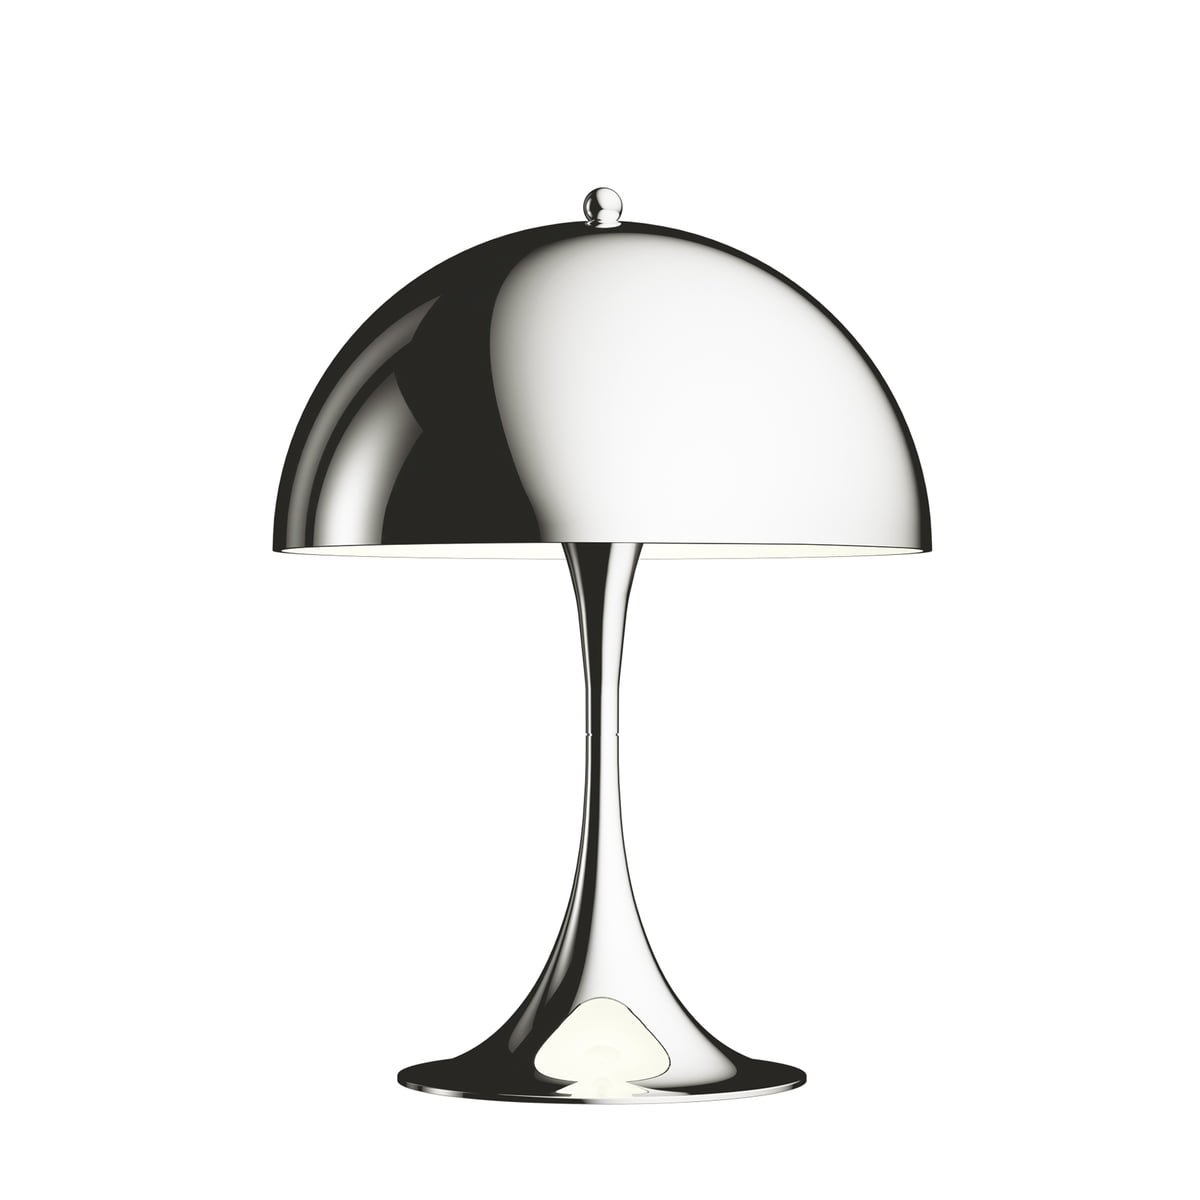 Panthella mini table lamp by louis poulsen the louis poulsen panthella mini table lamp 250 mirror finish chrome mozeypictures Choice Image